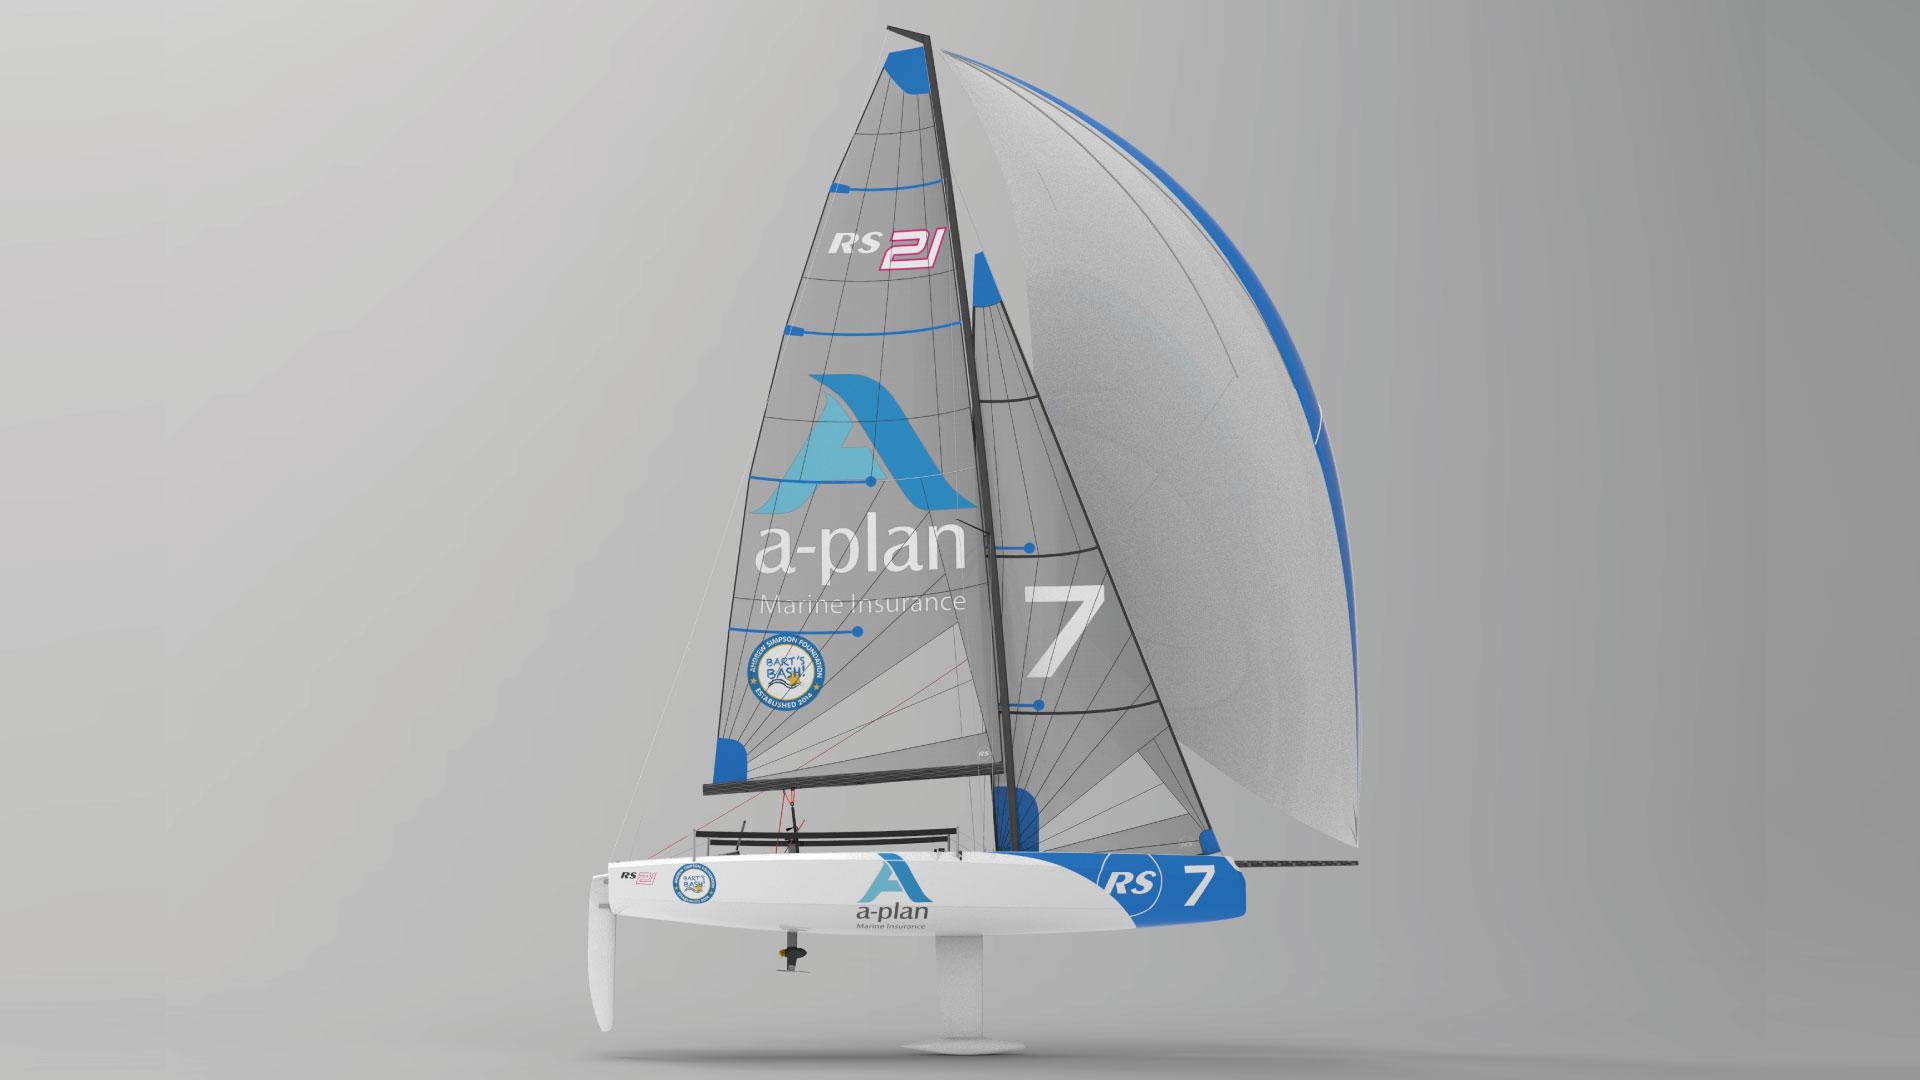 RS21 A-Plan